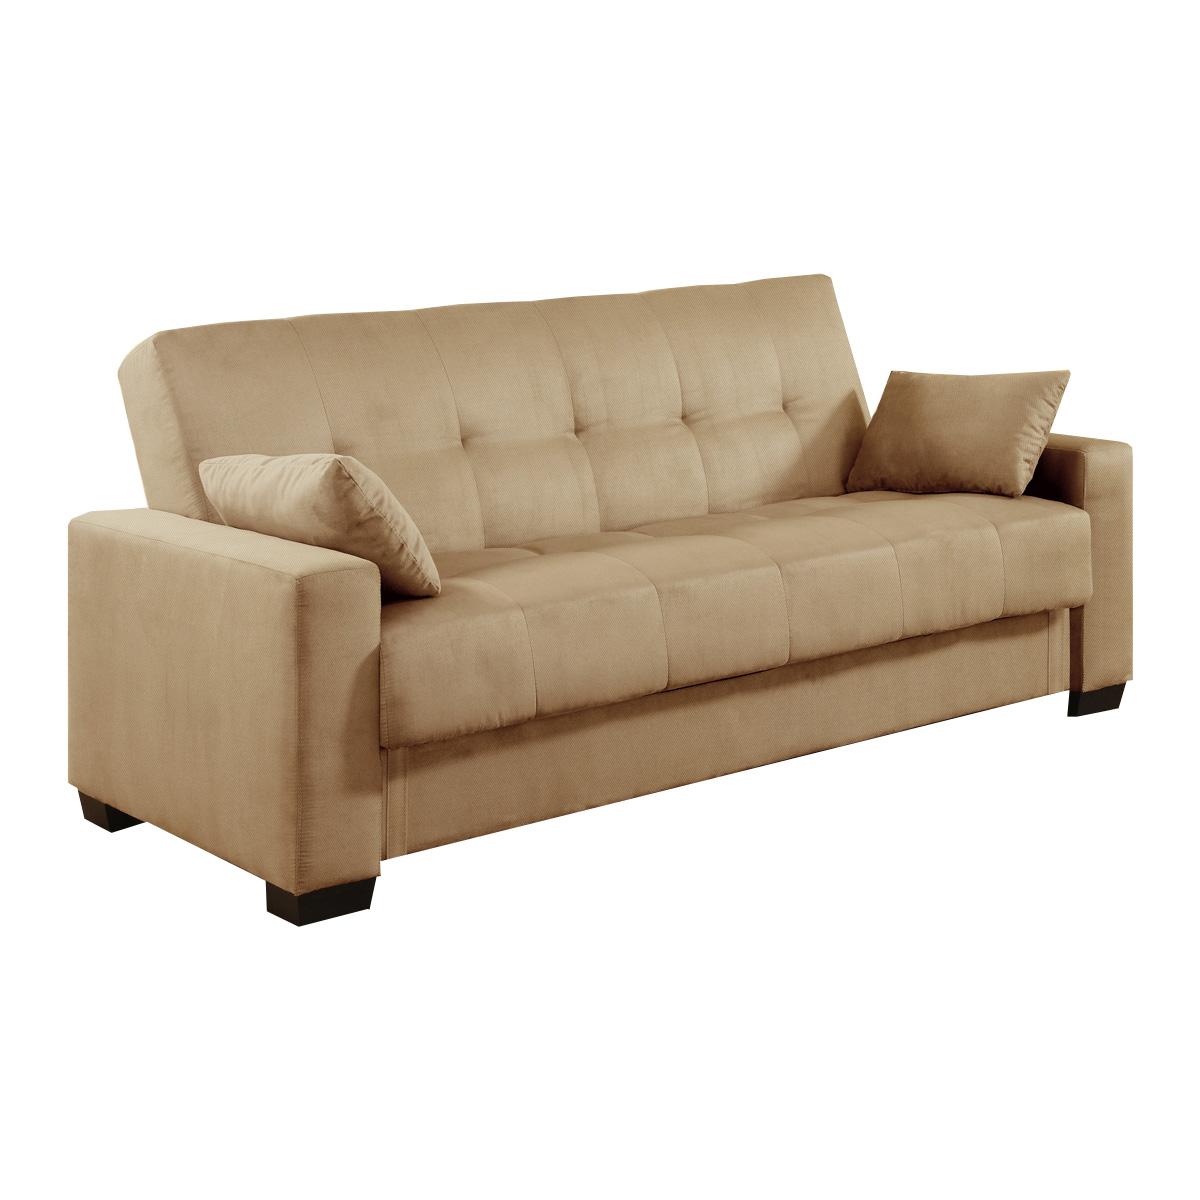 Napa convertible sofa bed beech ca npa jh set for Divan convertible